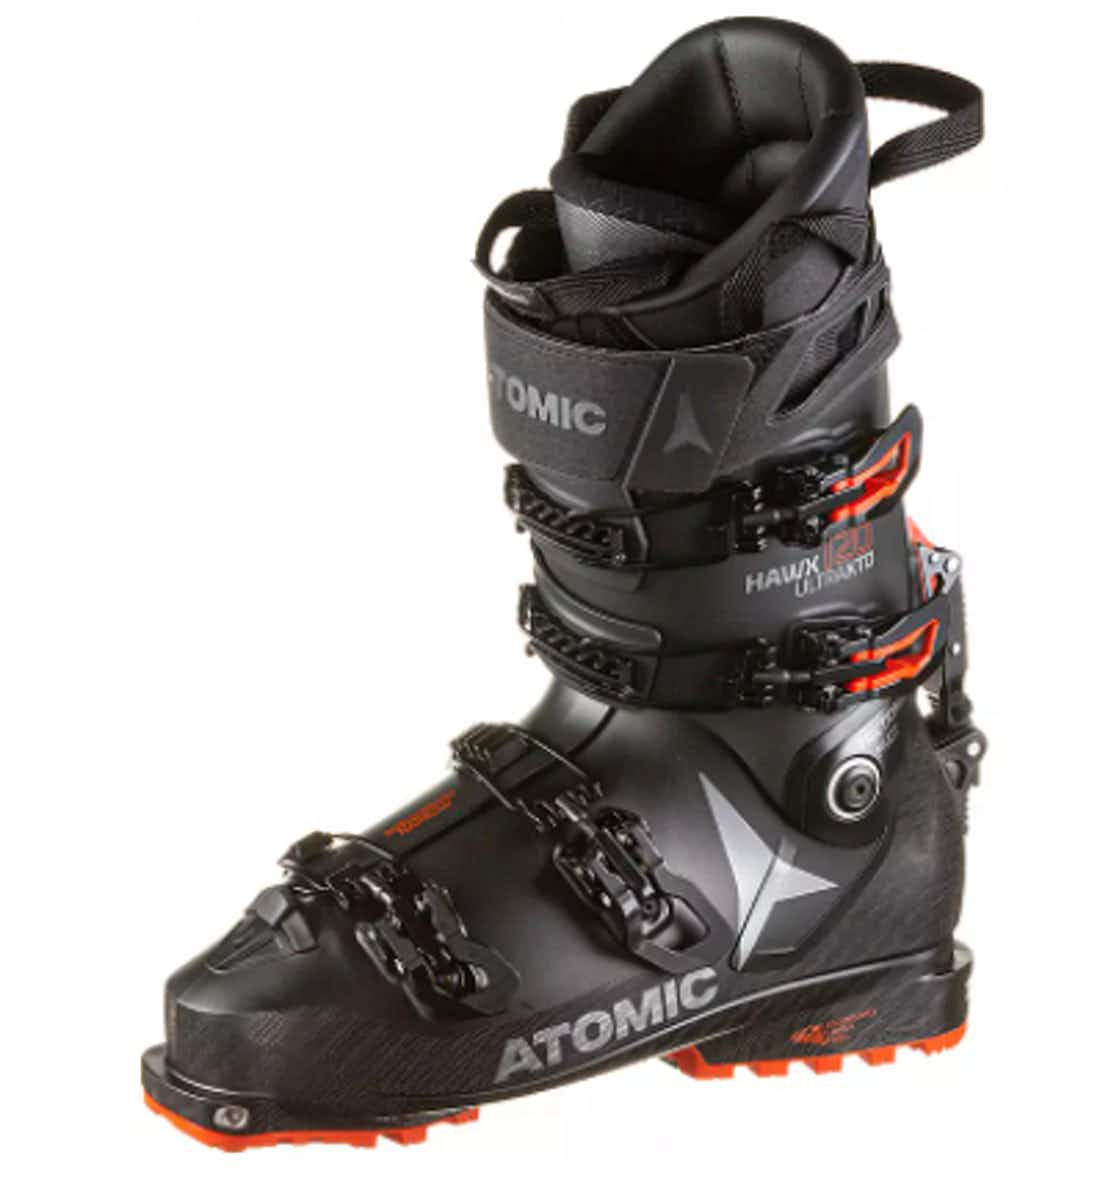 Atomic HAWX ULTRA XTD 120 TECH GW Skischuh